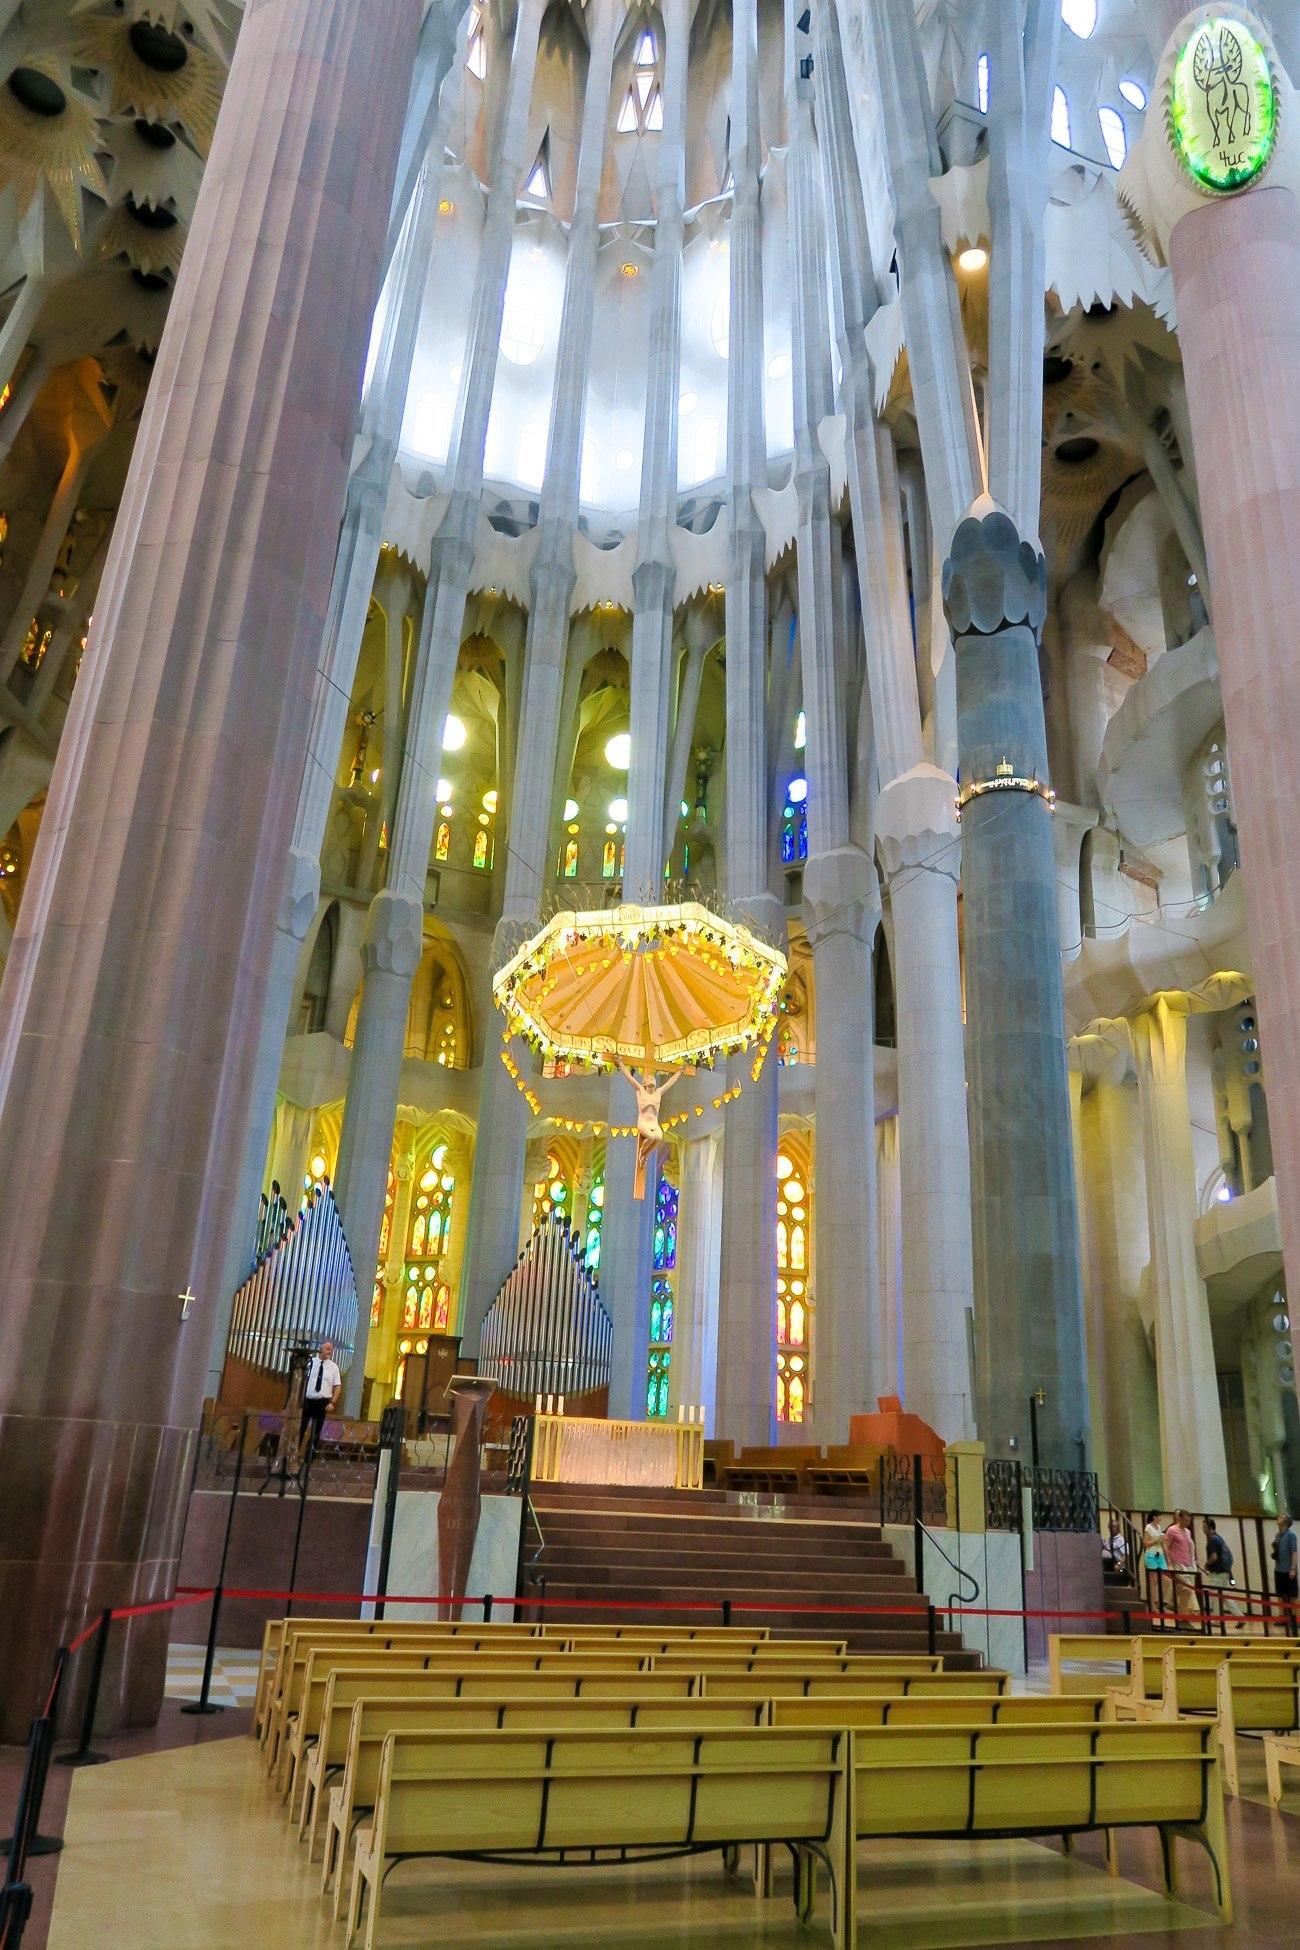 Stunning detail inside Gaudi's Sagrada Familia in Barcelona.